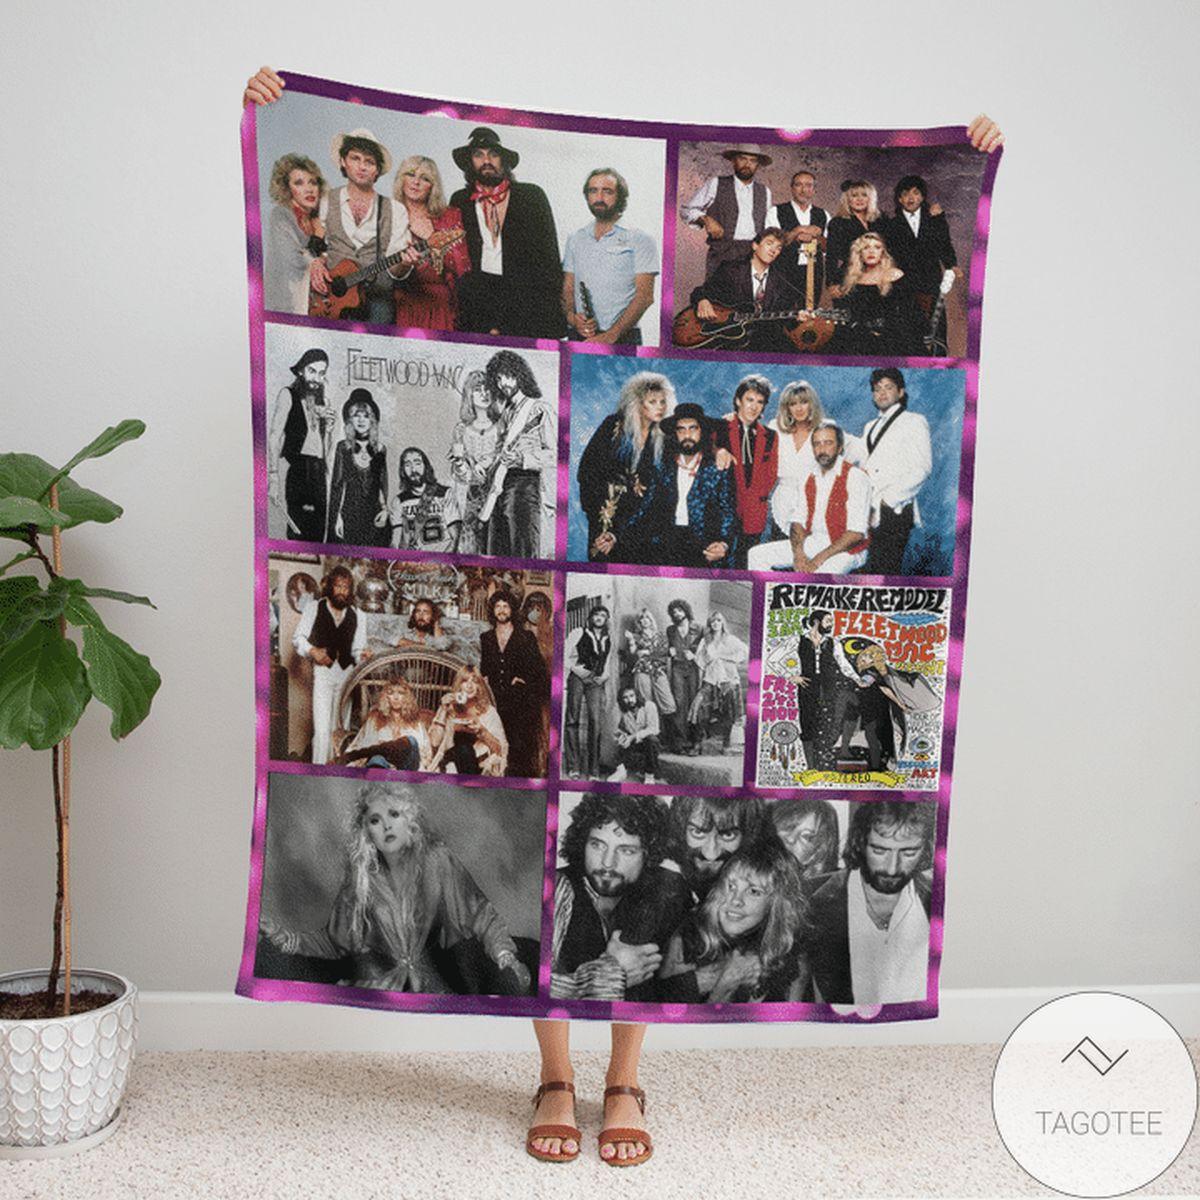 Fleetwood Mac Anniversary Blanket